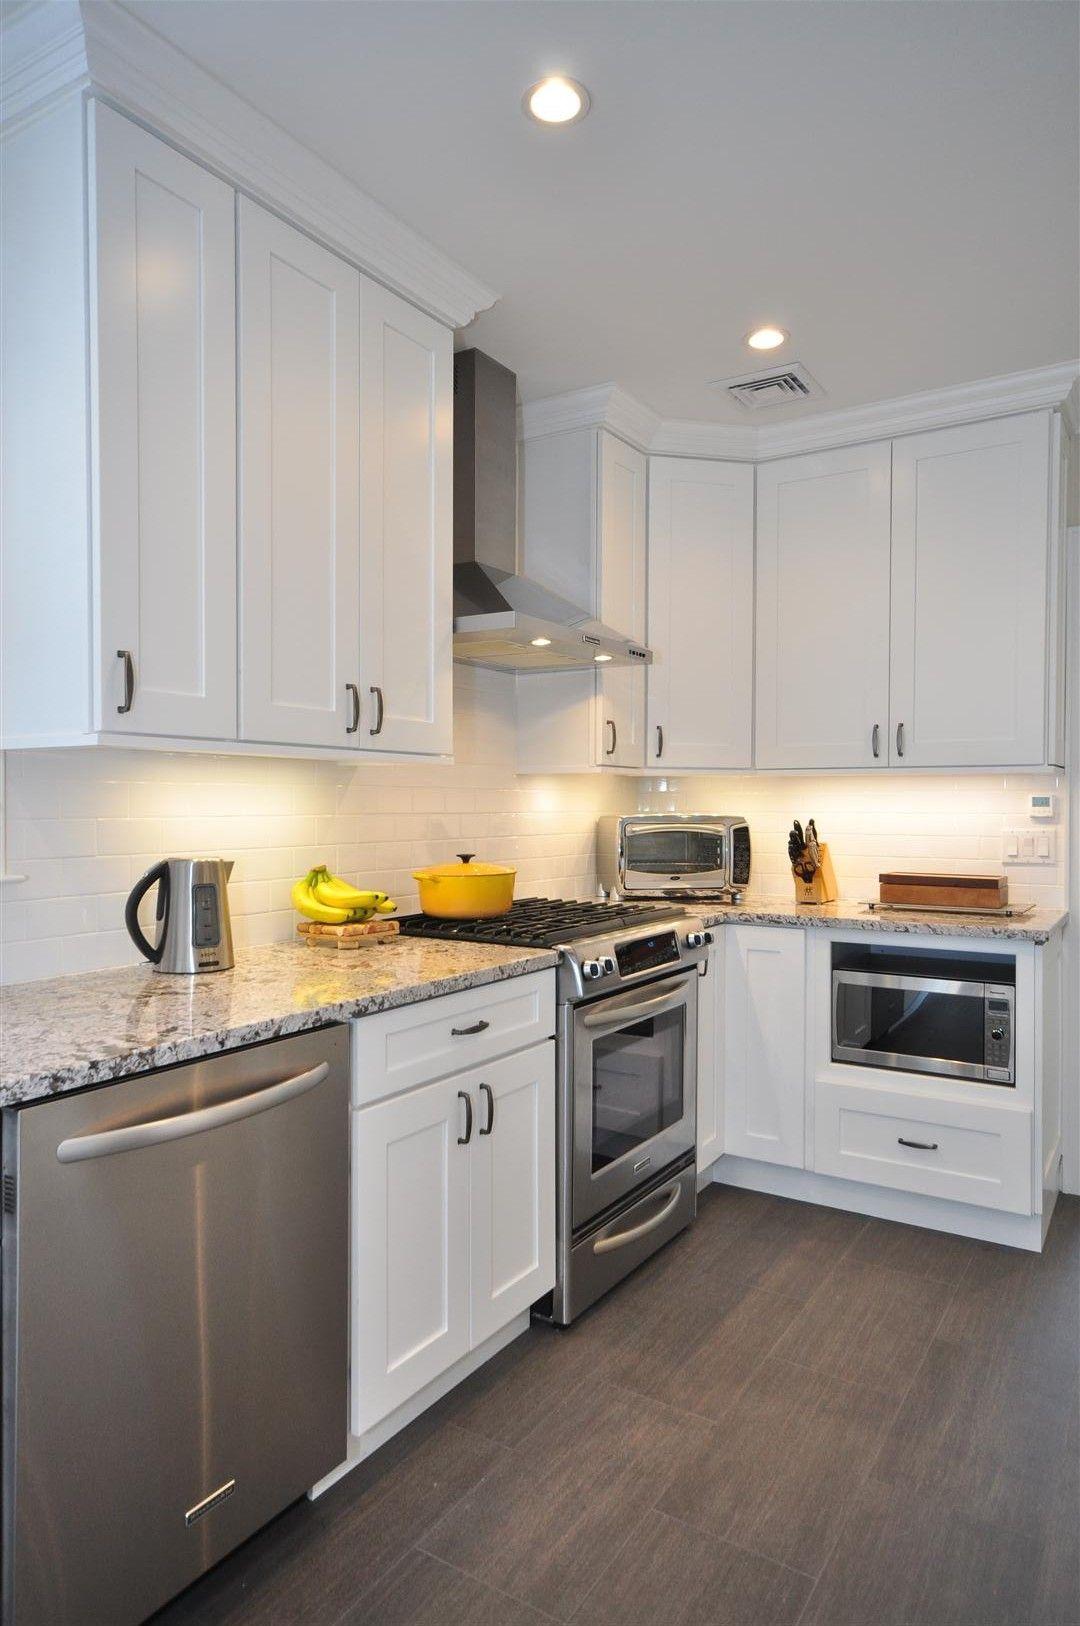 white cabinet kitchen white shaker kitchen cabinets Gray Floor Gray Counter tops